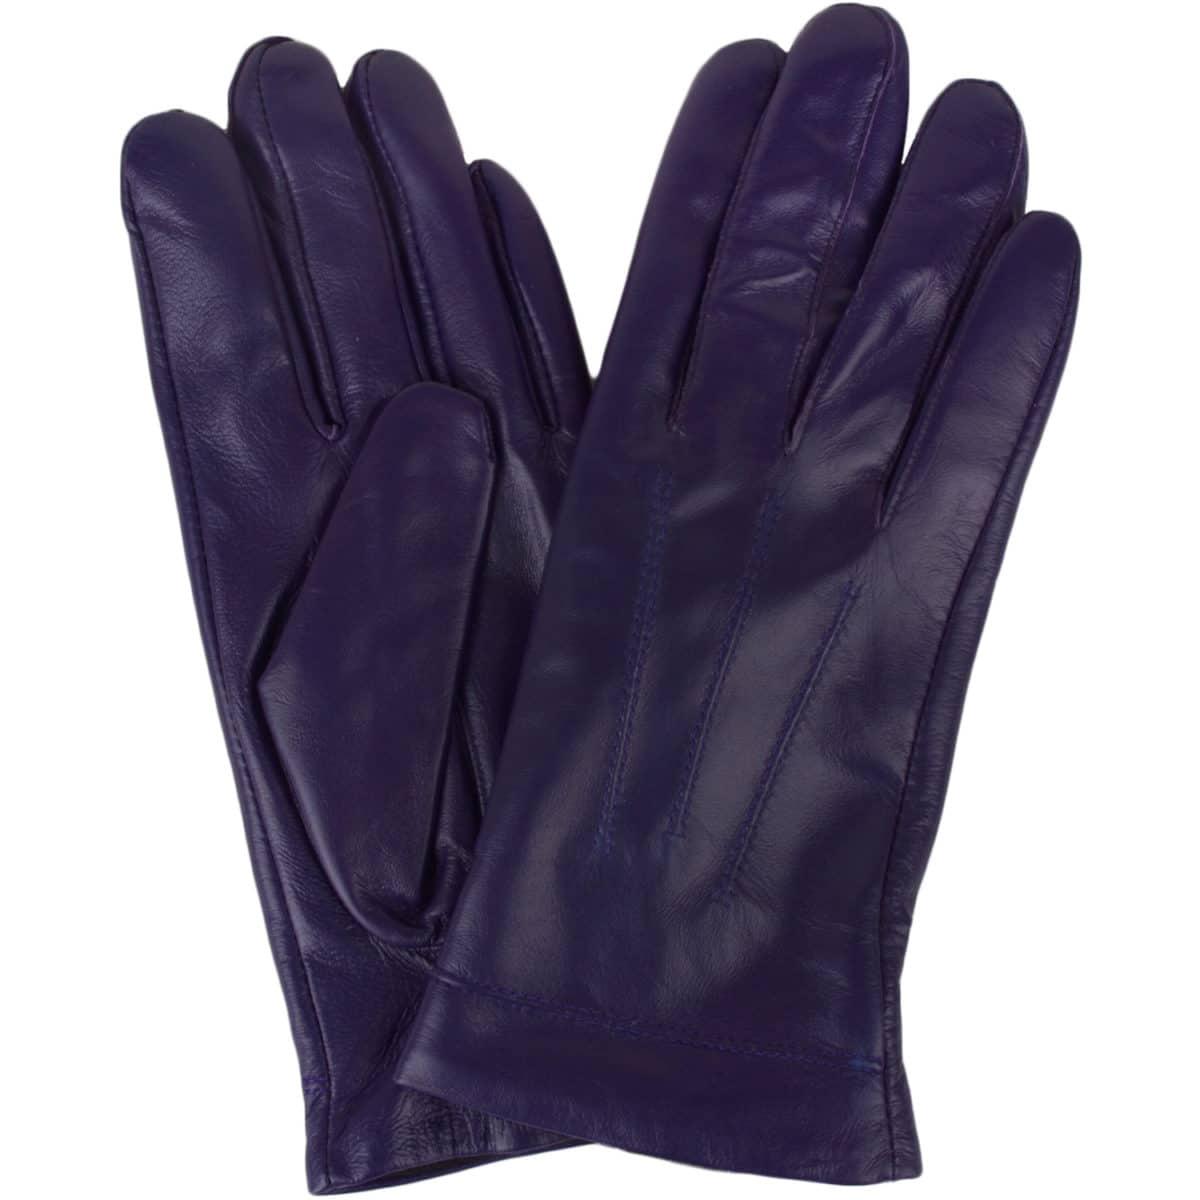 Mavis Leather Gloves Three Point Stitch Purple Snugrugs